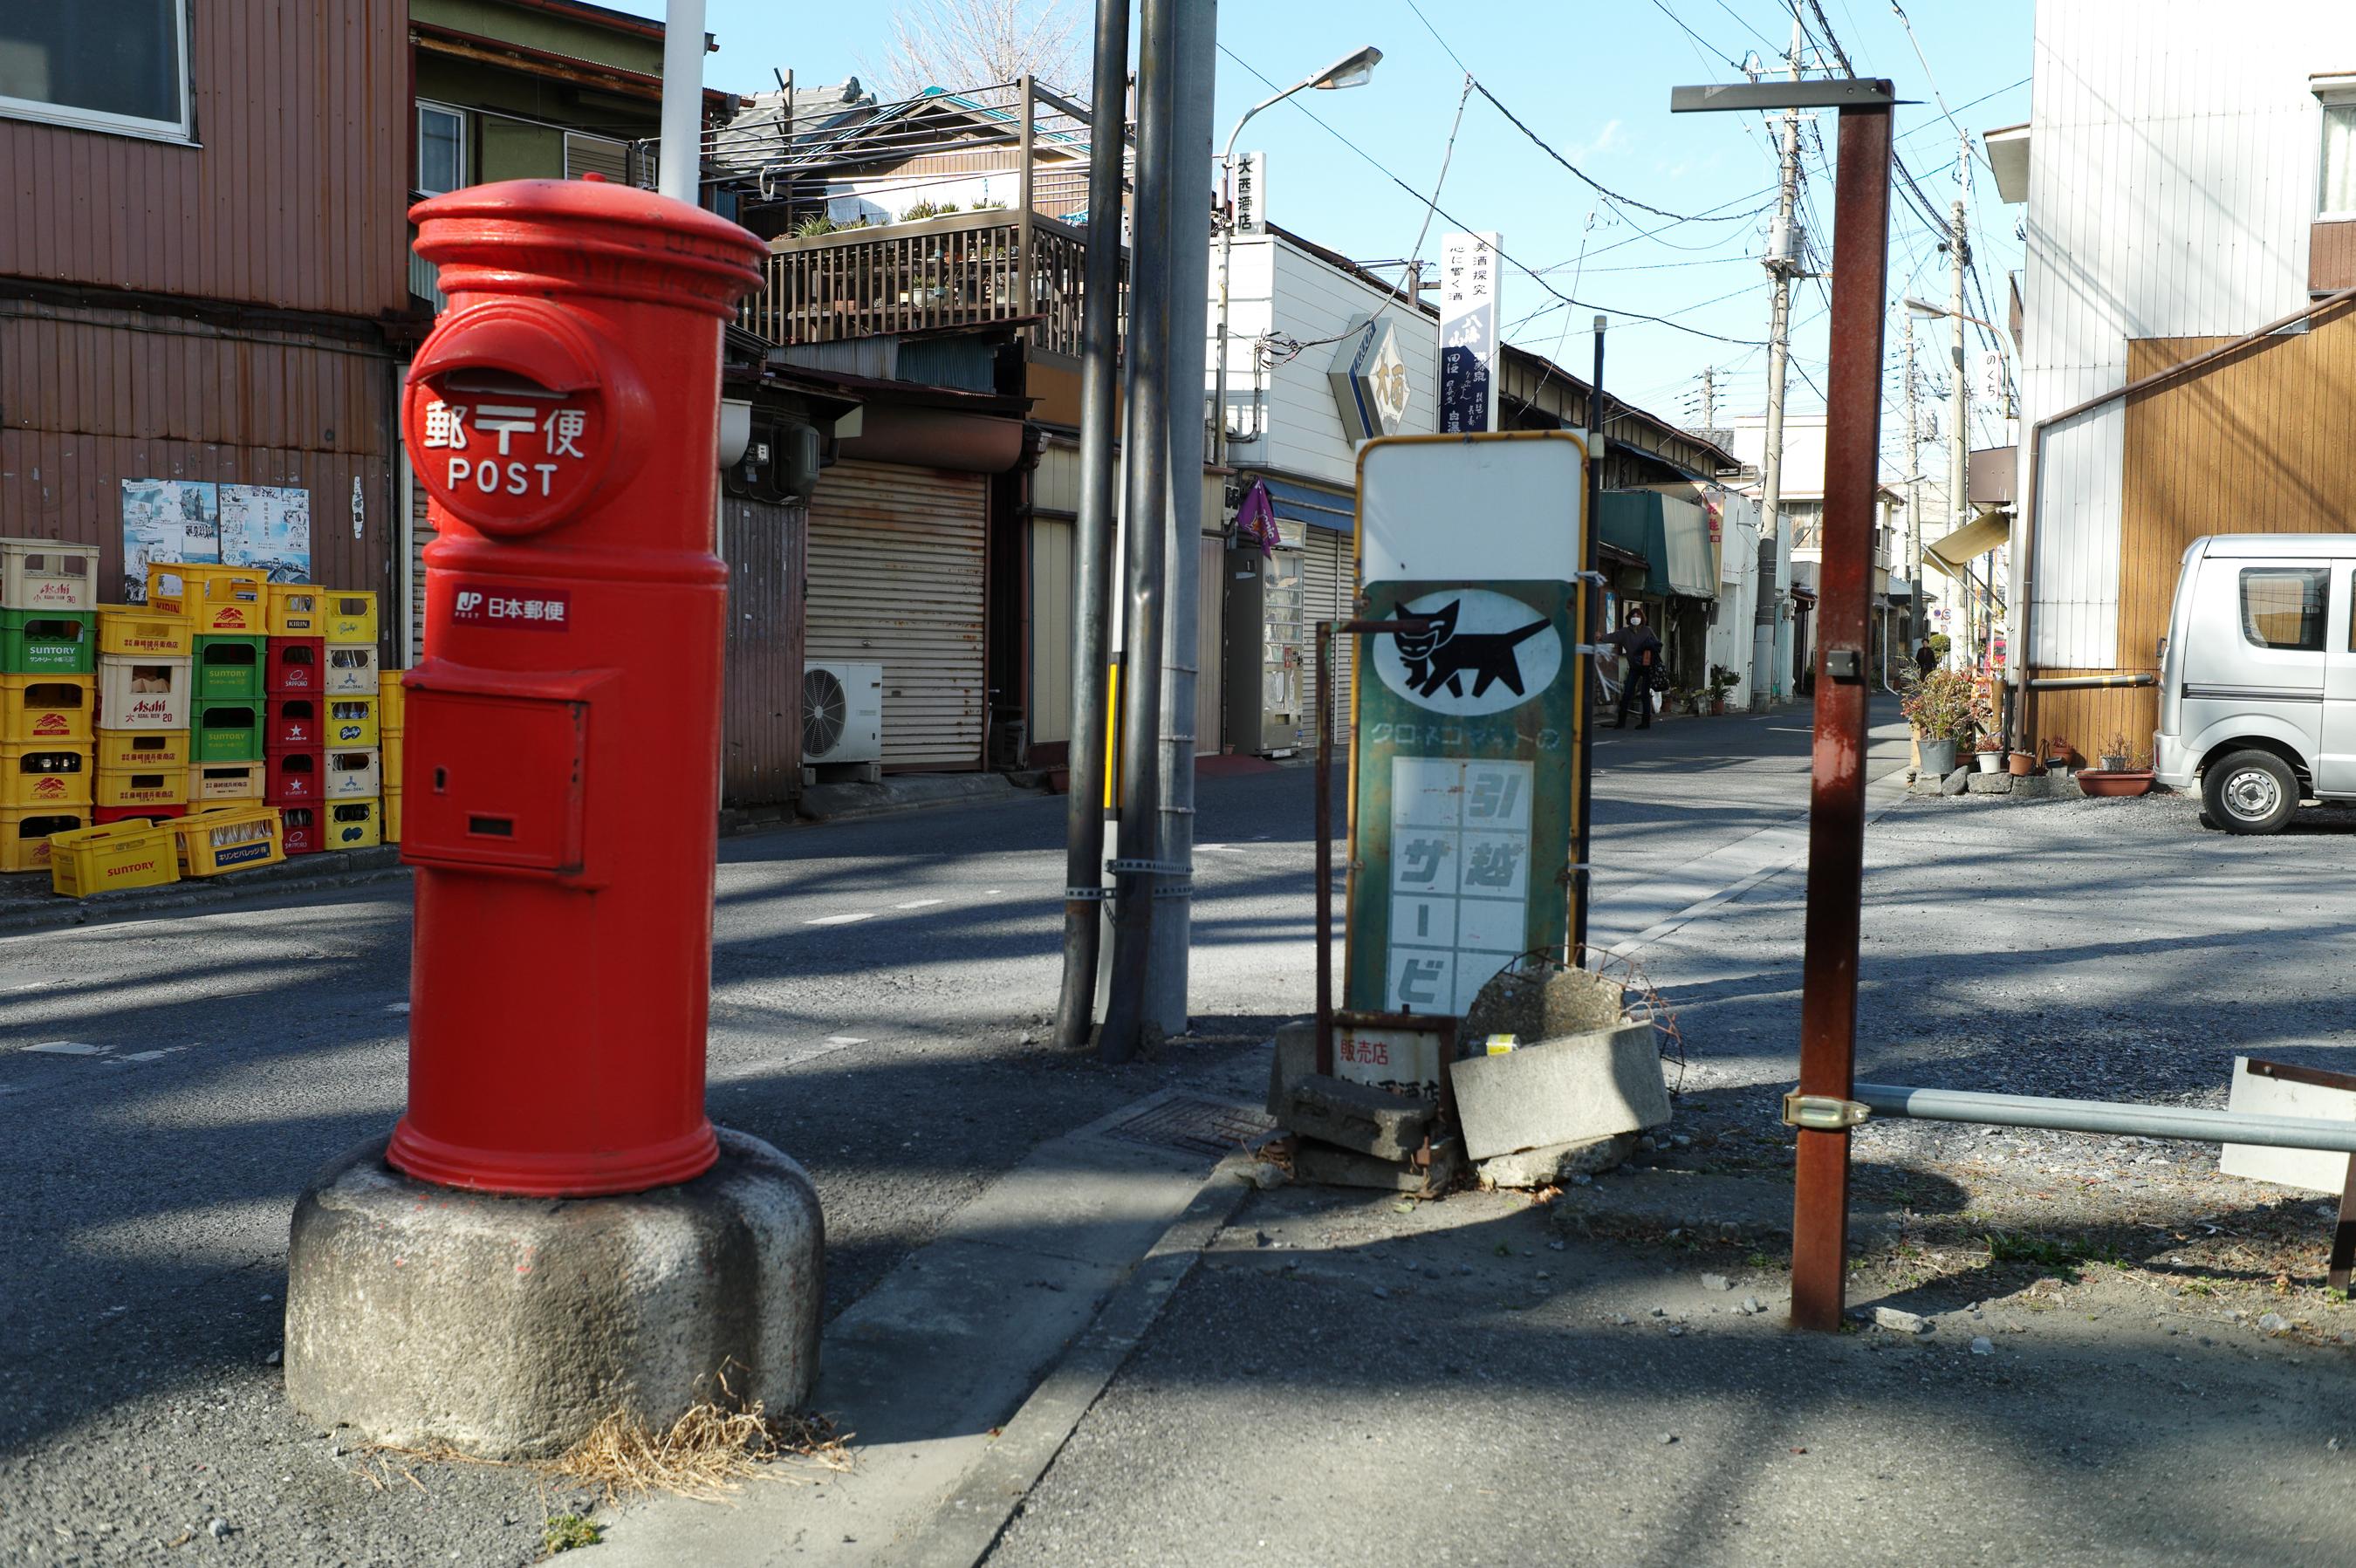 f:id:aoyama-takuro:20180211224351j:plain